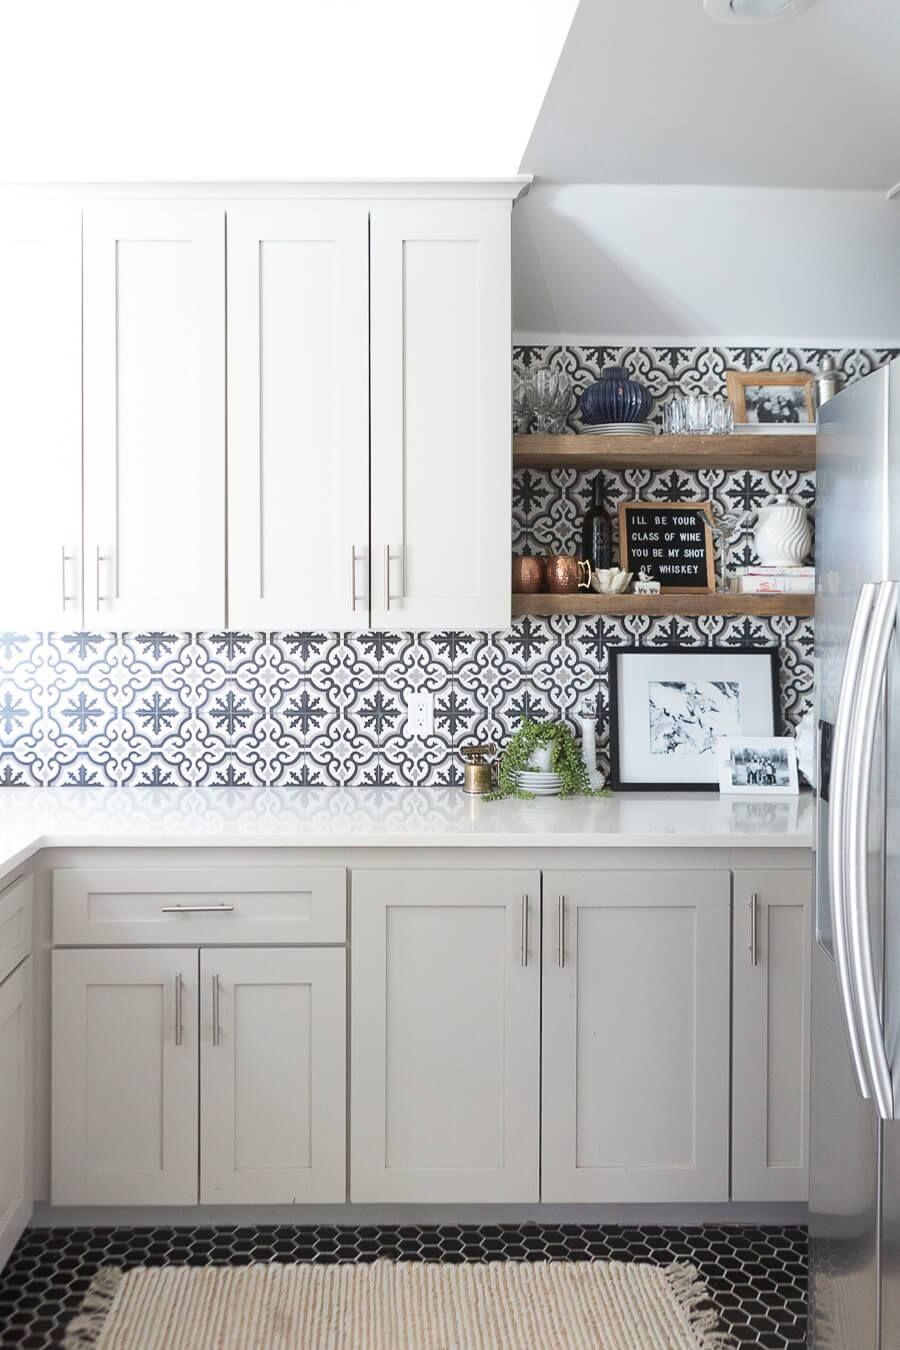 11 Kitchen Tile Backsplash Ideas for White Cabinets – That Aren't White